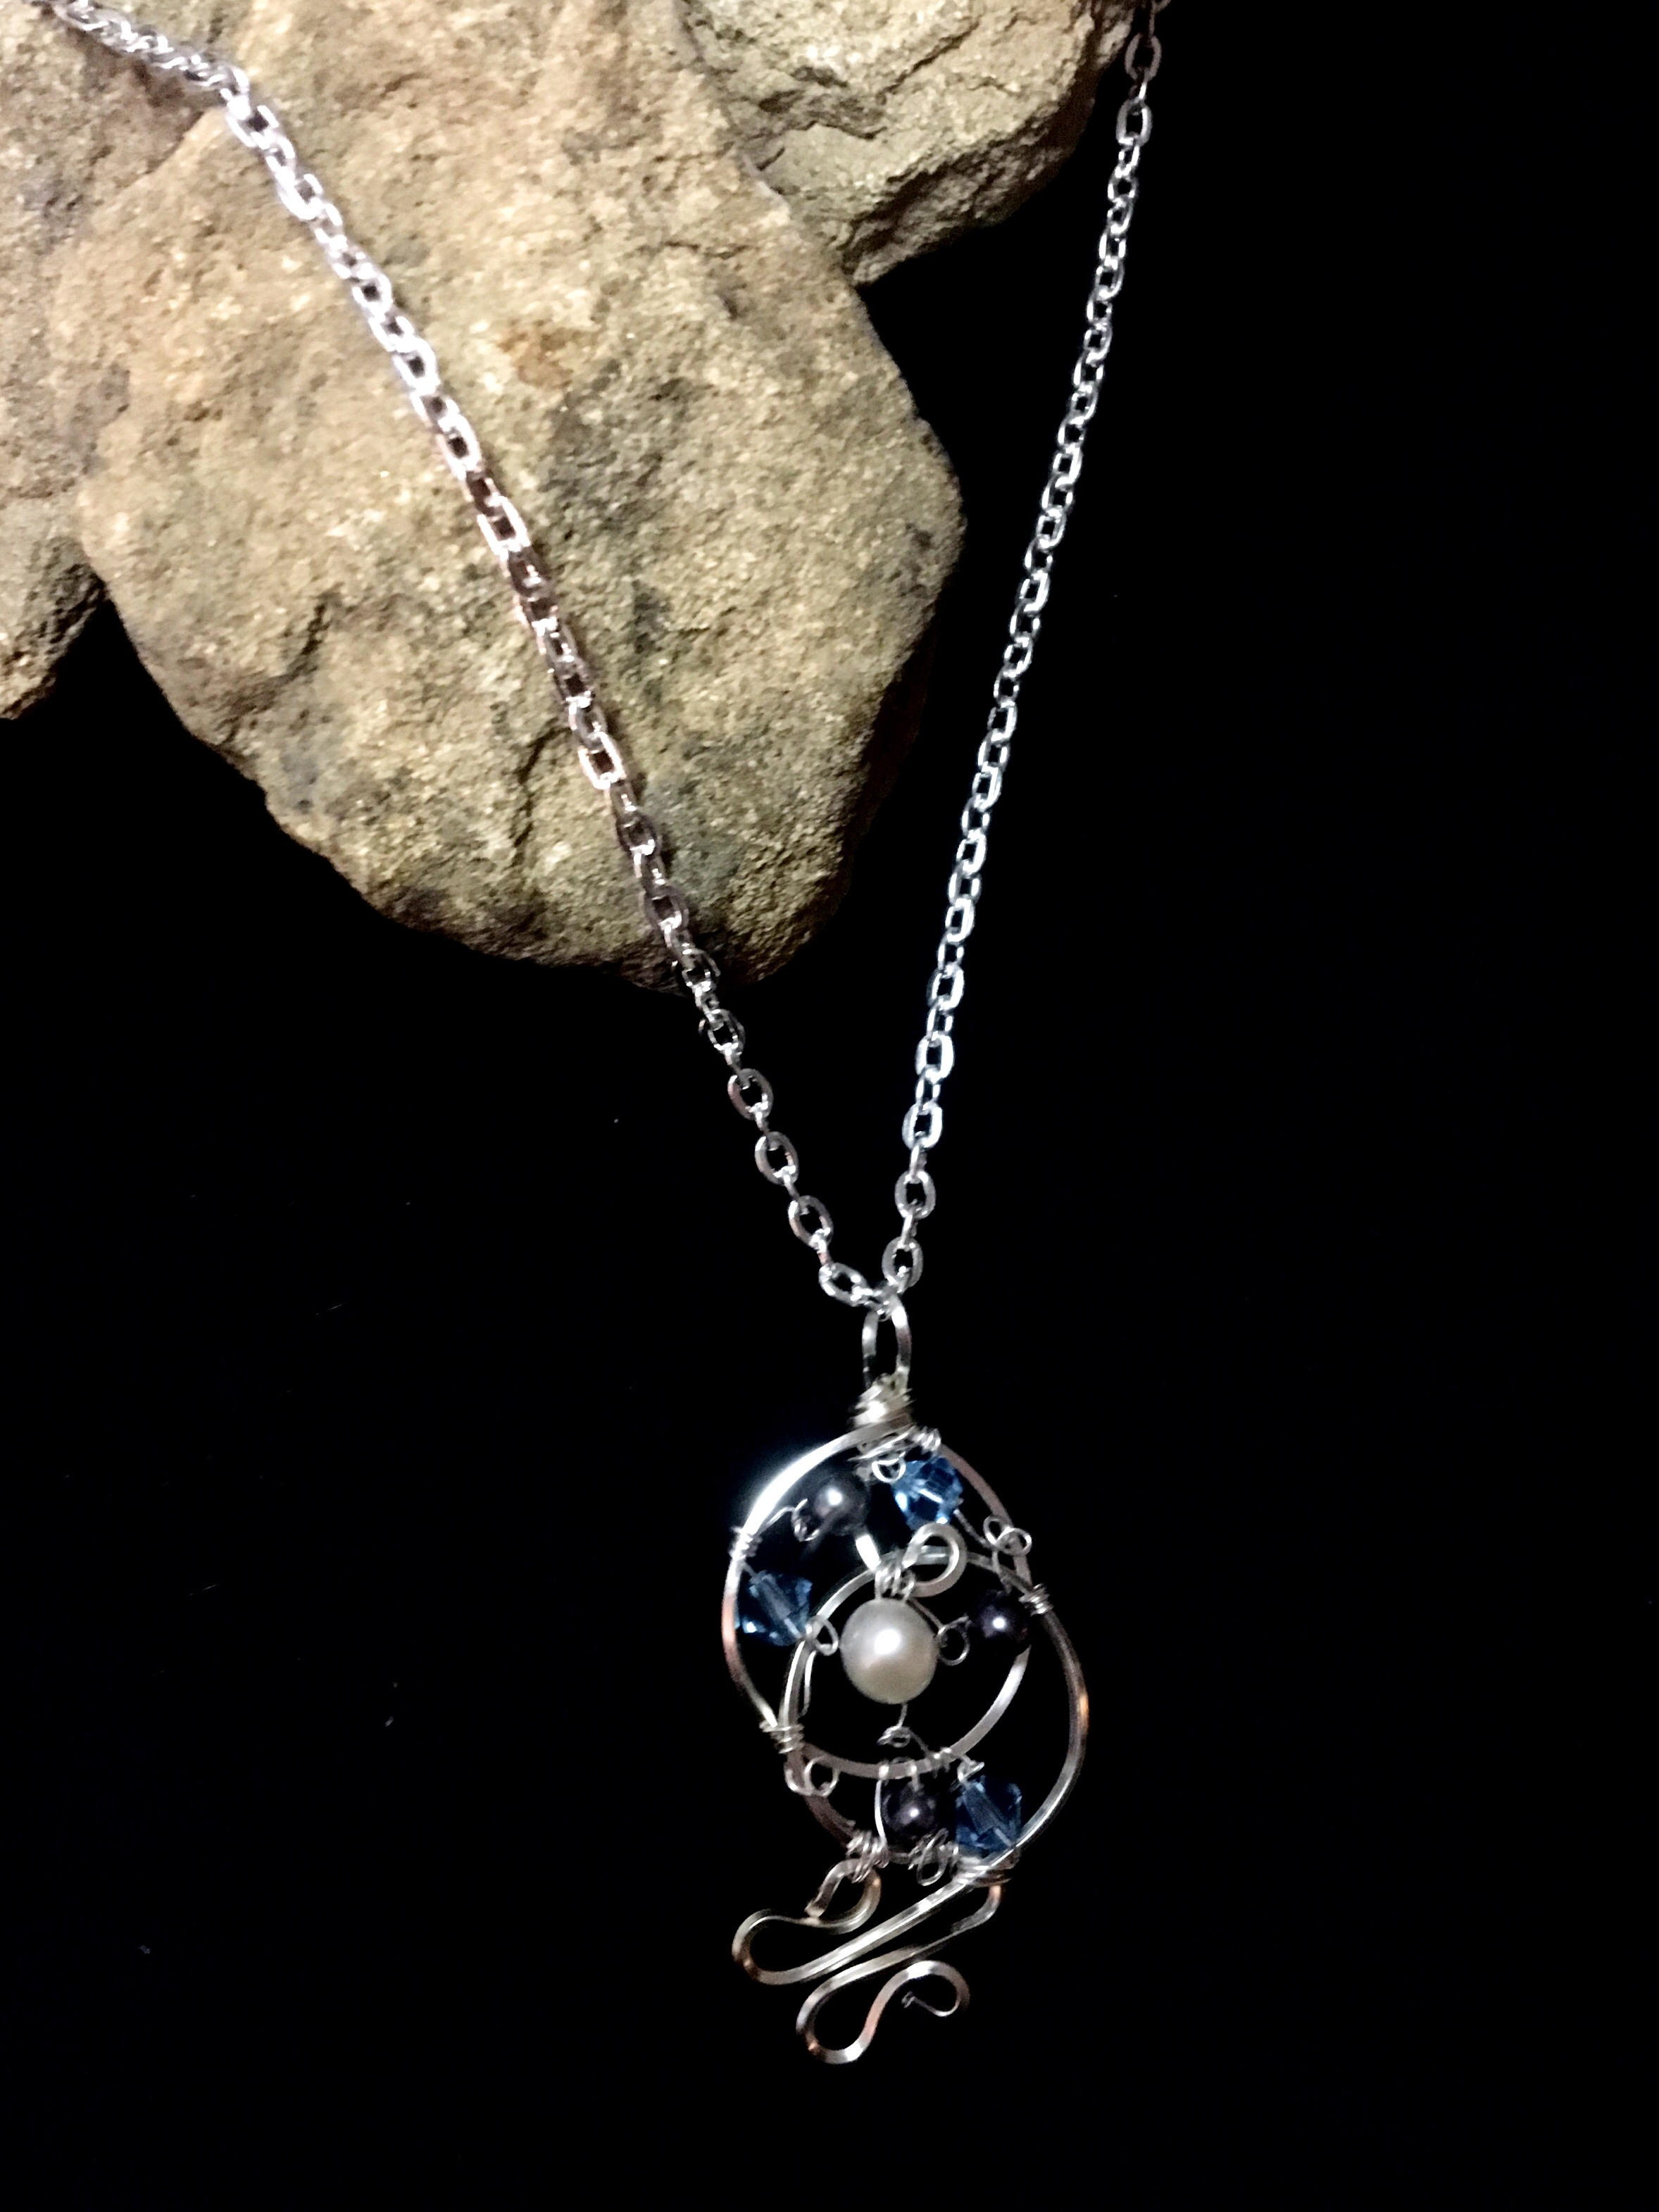 Dainty Deva Necklace - Pearls and blue swarovsky - Silver Plated